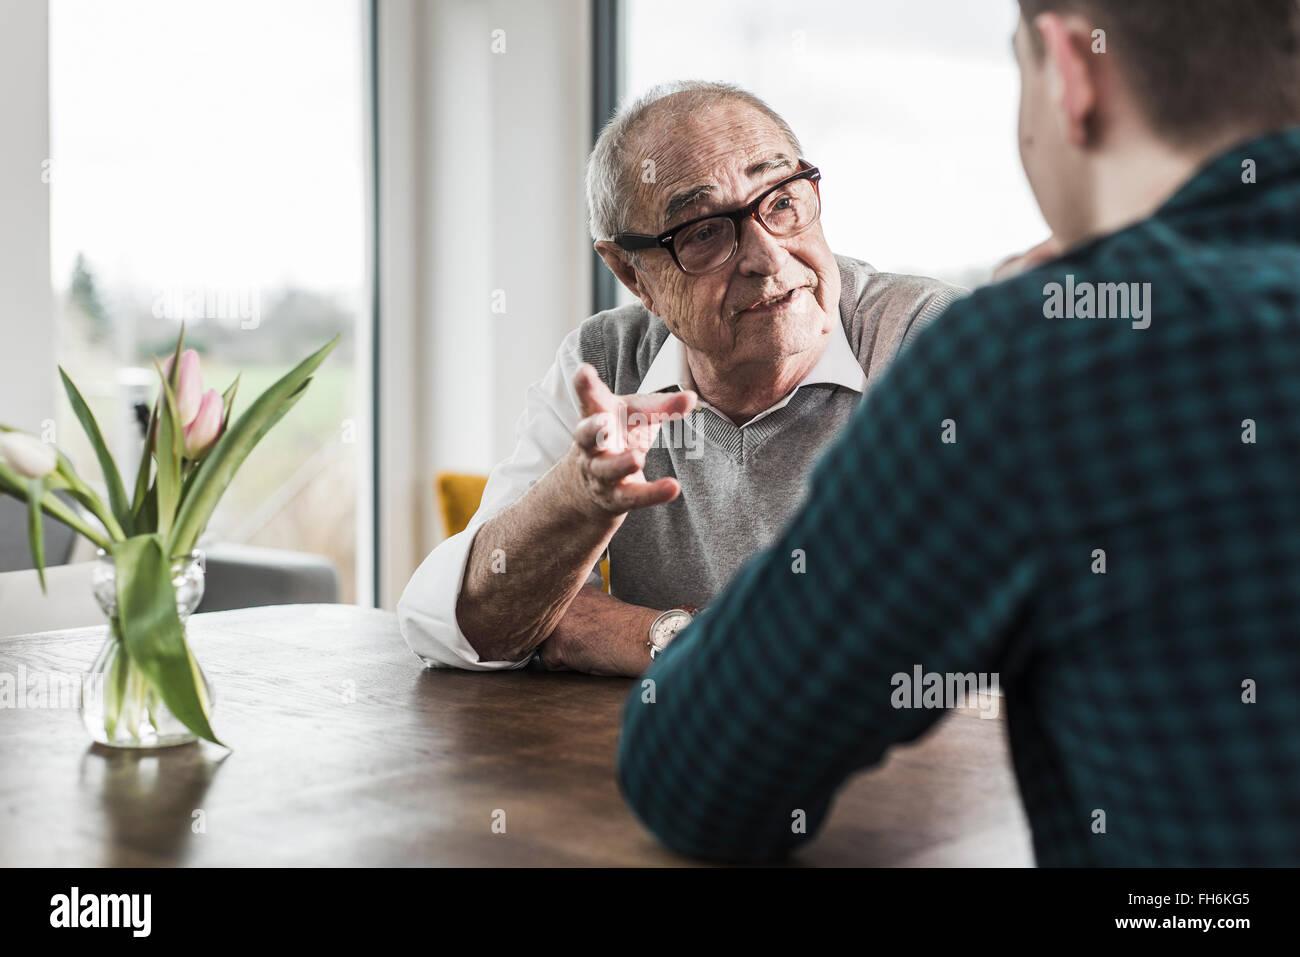 Retrato del hombre senior comunicarse con su nieto Imagen De Stock